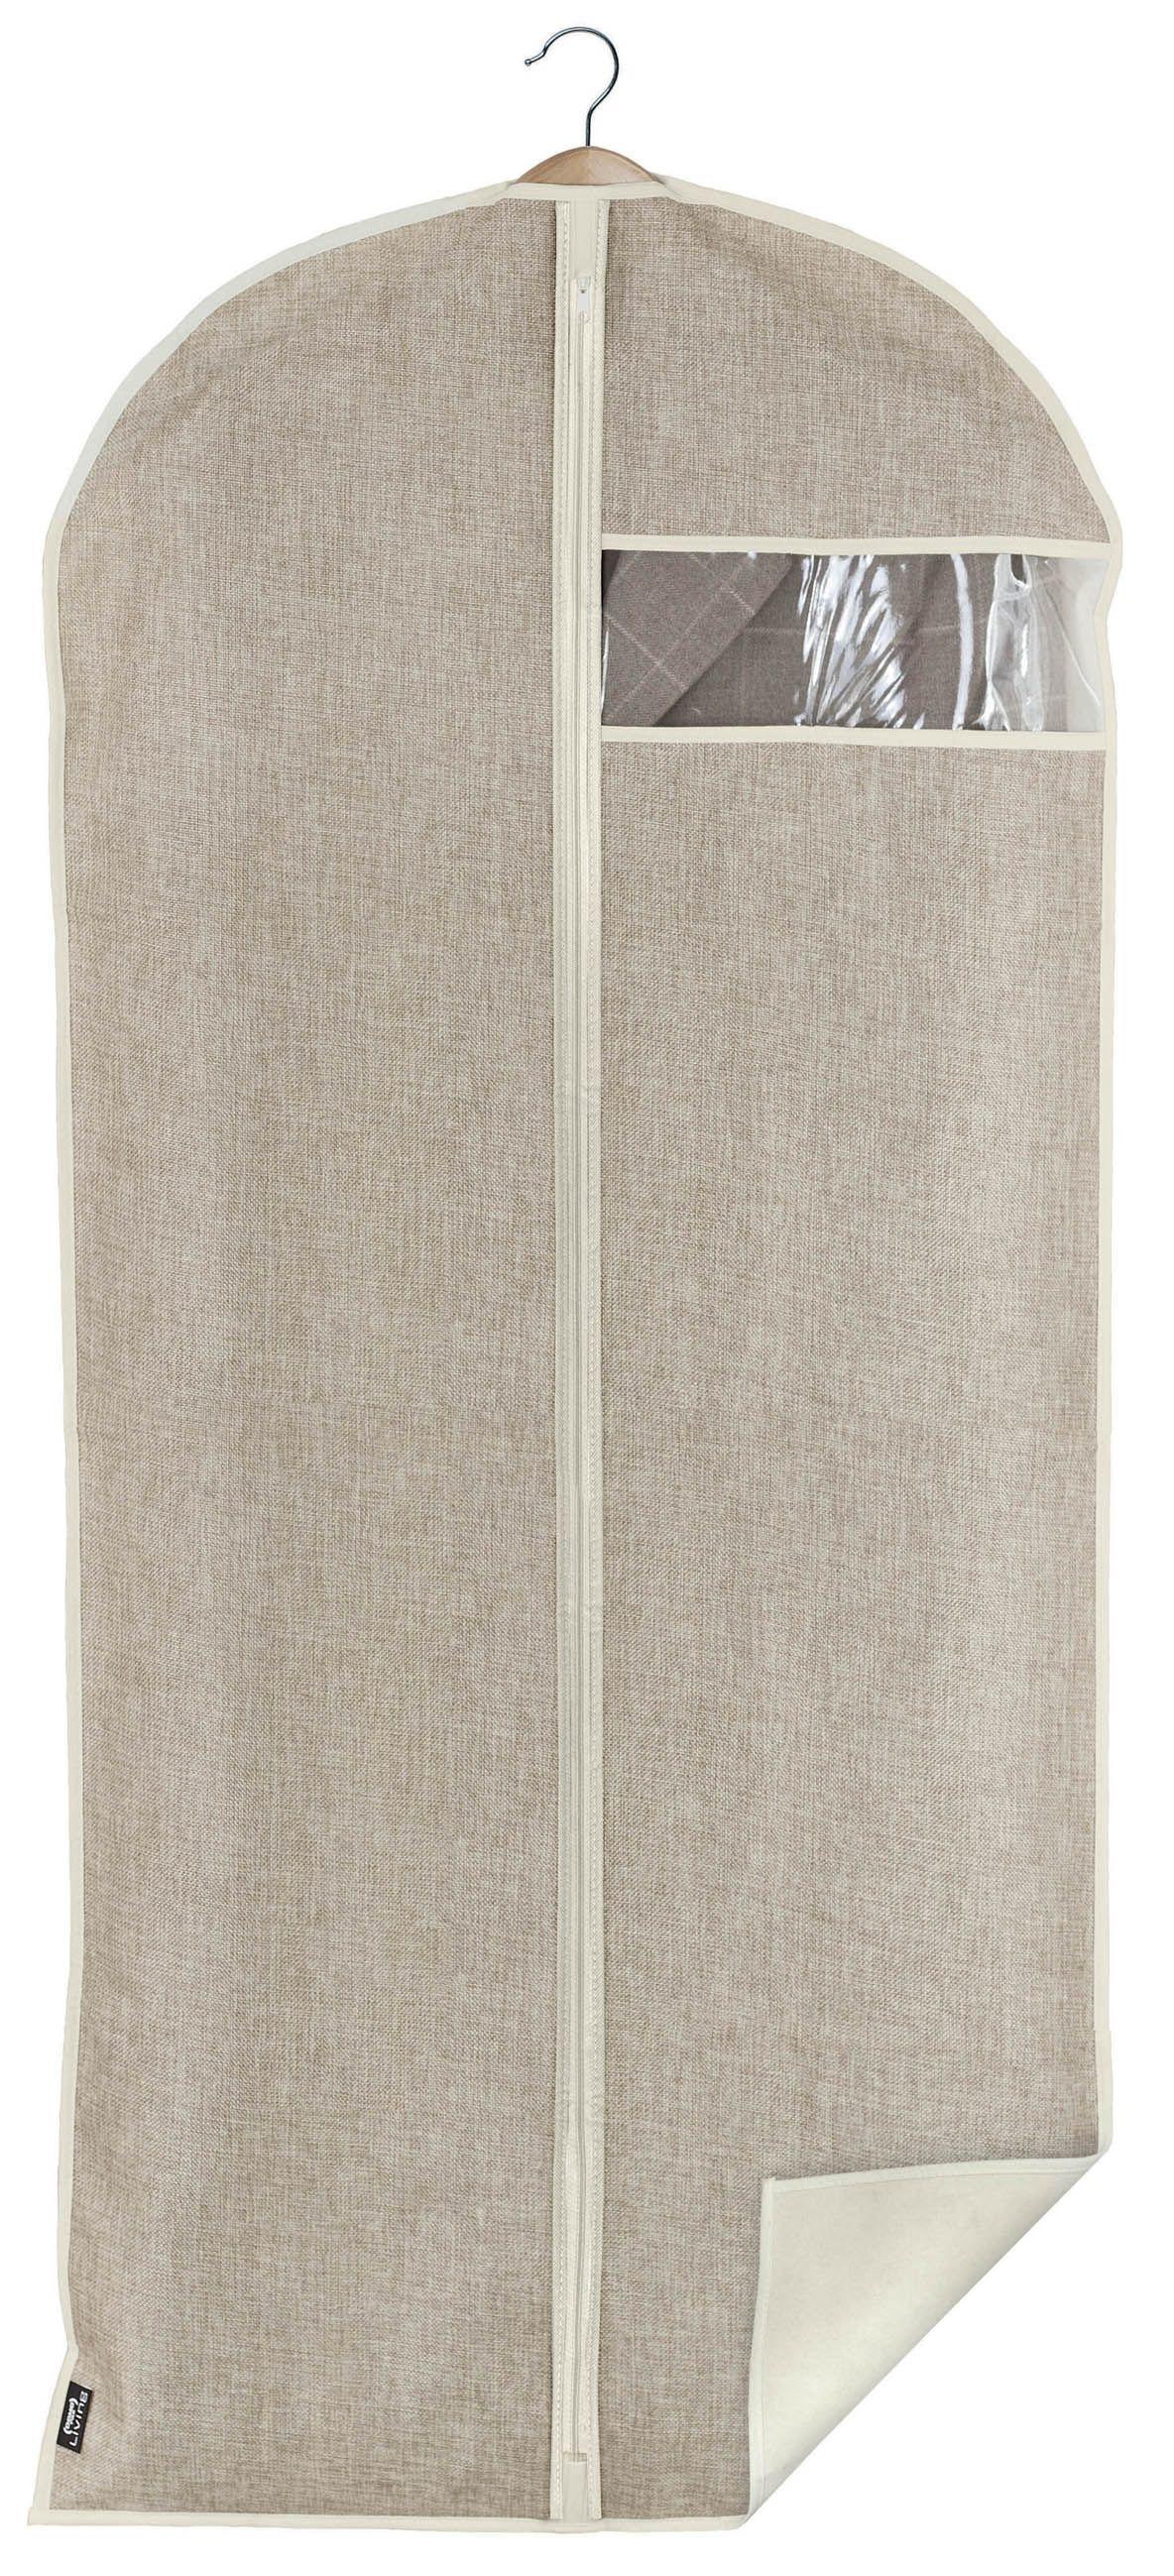 Husa pentru haine cu fermoar, Maison XL Crem, l60xH135 cm poza